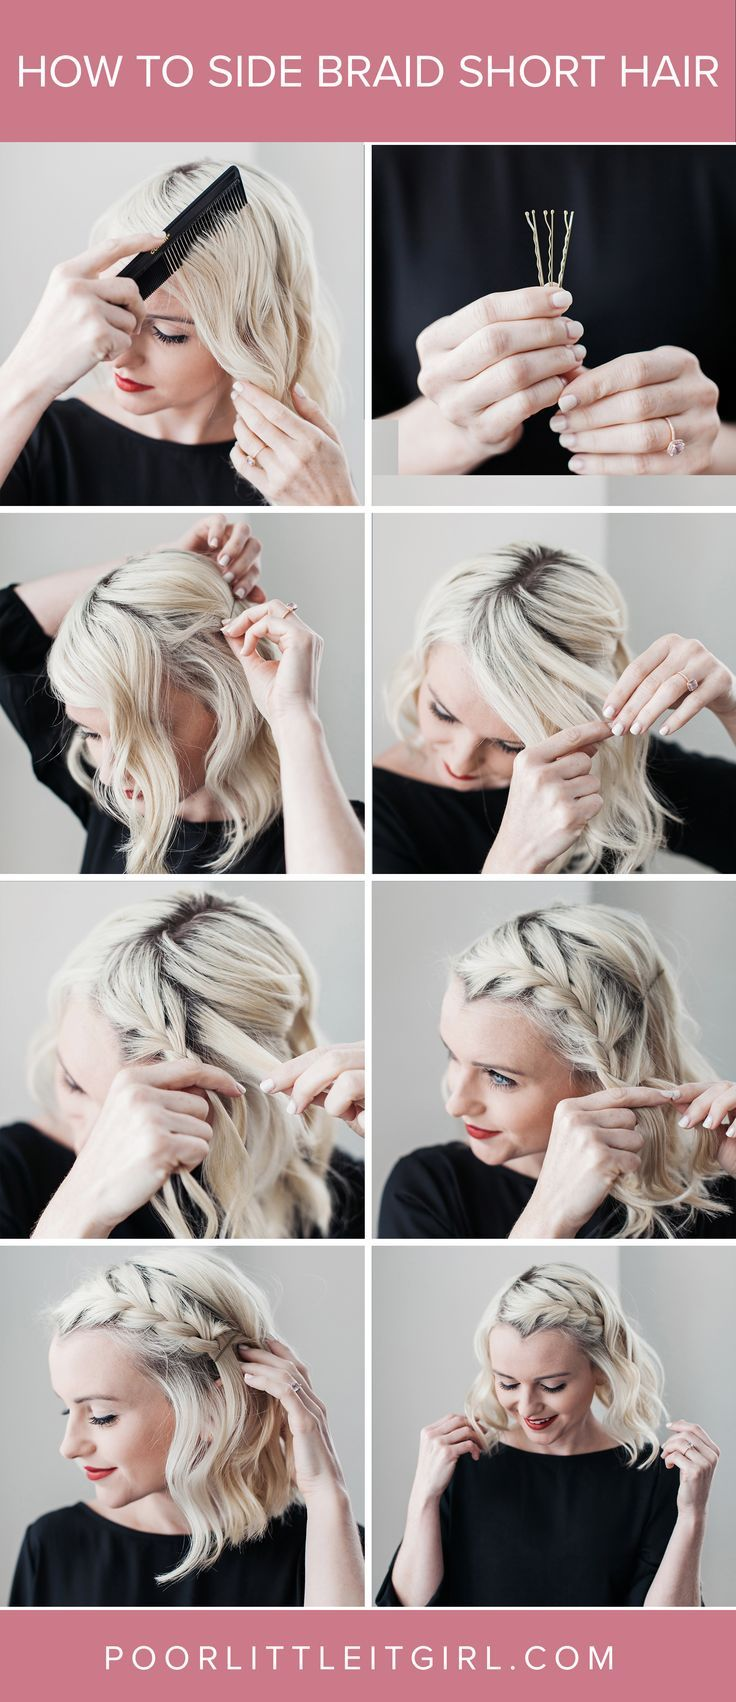 Makeup Ideas: How To Side Braid Short Hair – Hair Tutorial – Braid – Poor Little It Girl…